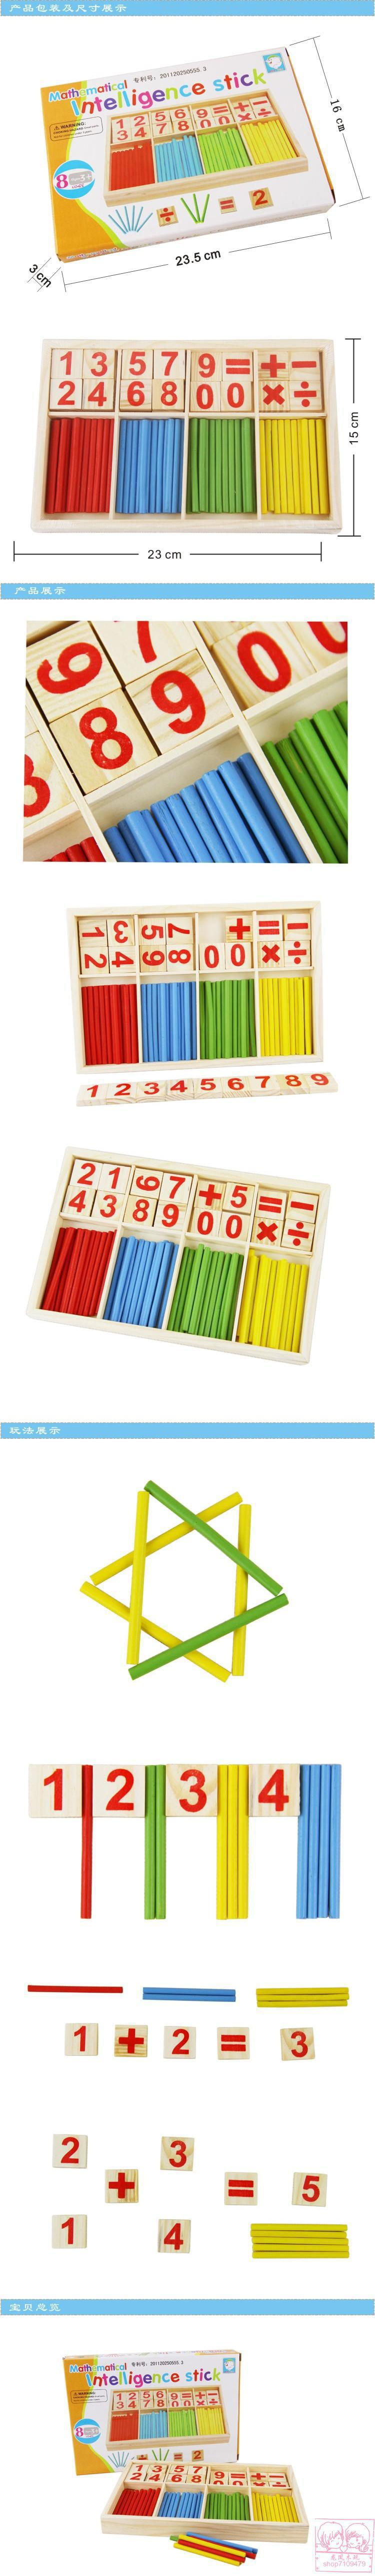 Montessori Holzzahl Math Game Sticks Box Lernspielzeug Puzzle Lehrmittel Set Materialien